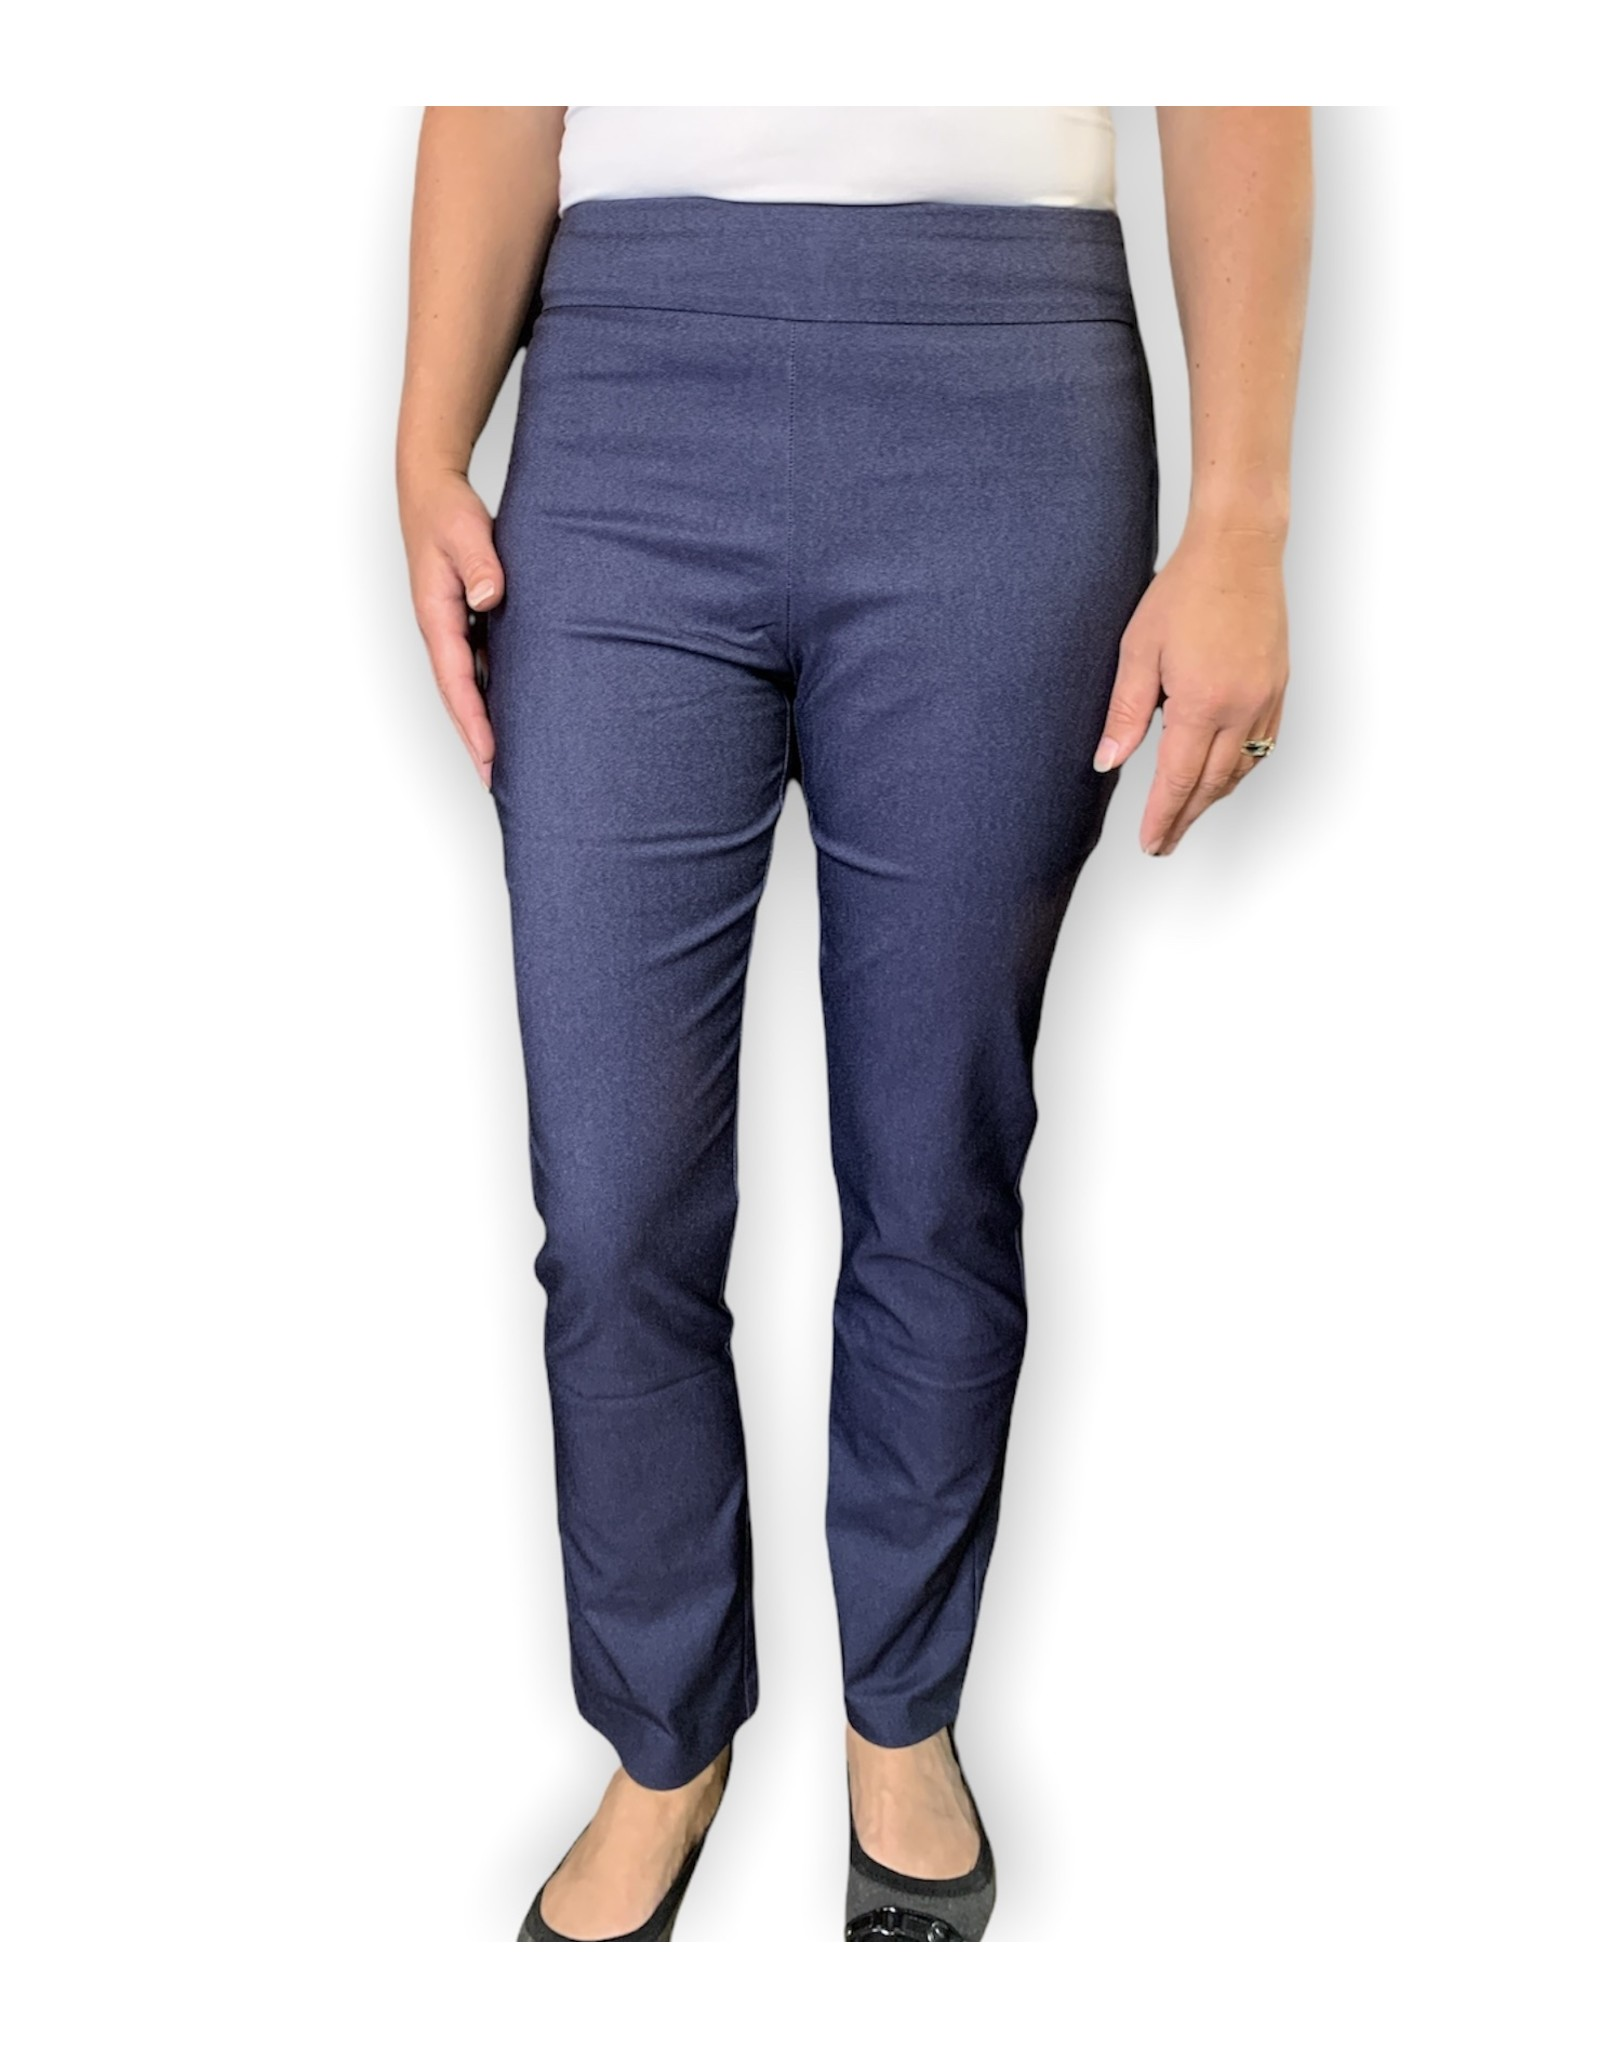 Eric Casual Millennium Pants